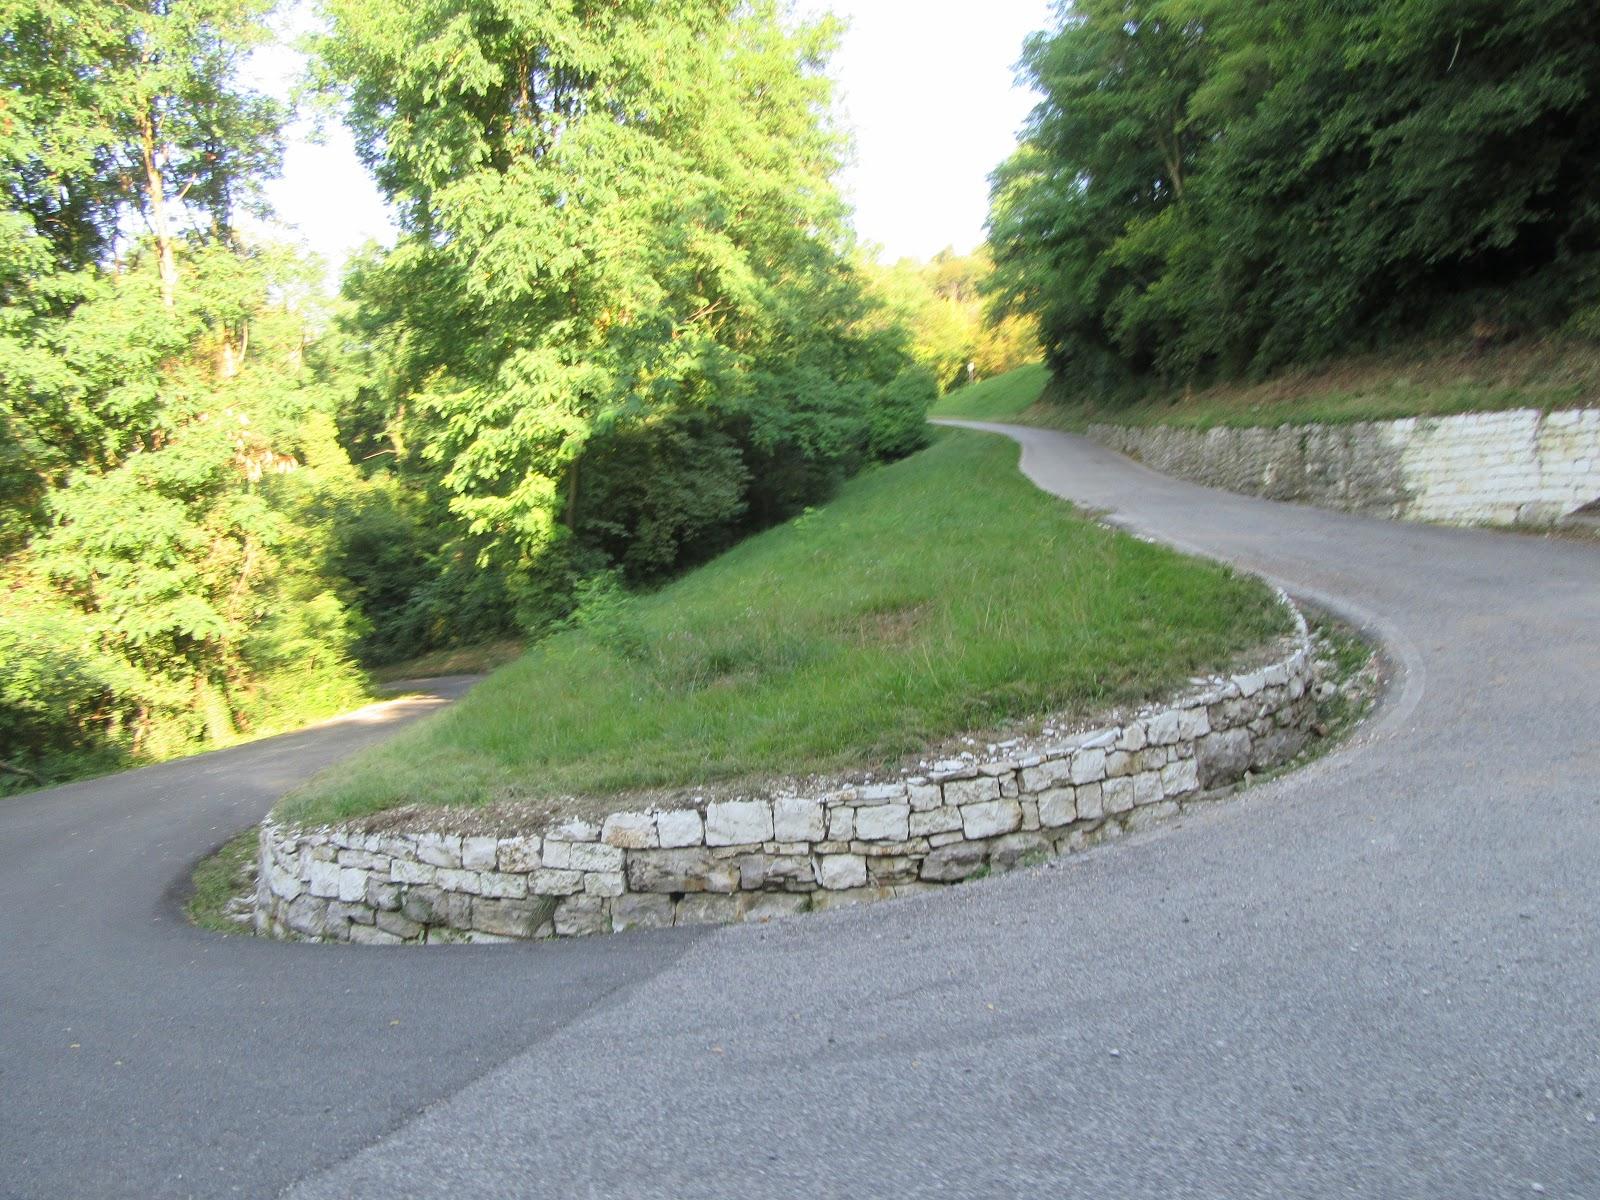 Climbing Monte Grappa - Cavaso del Tomba - hairpin and roadway